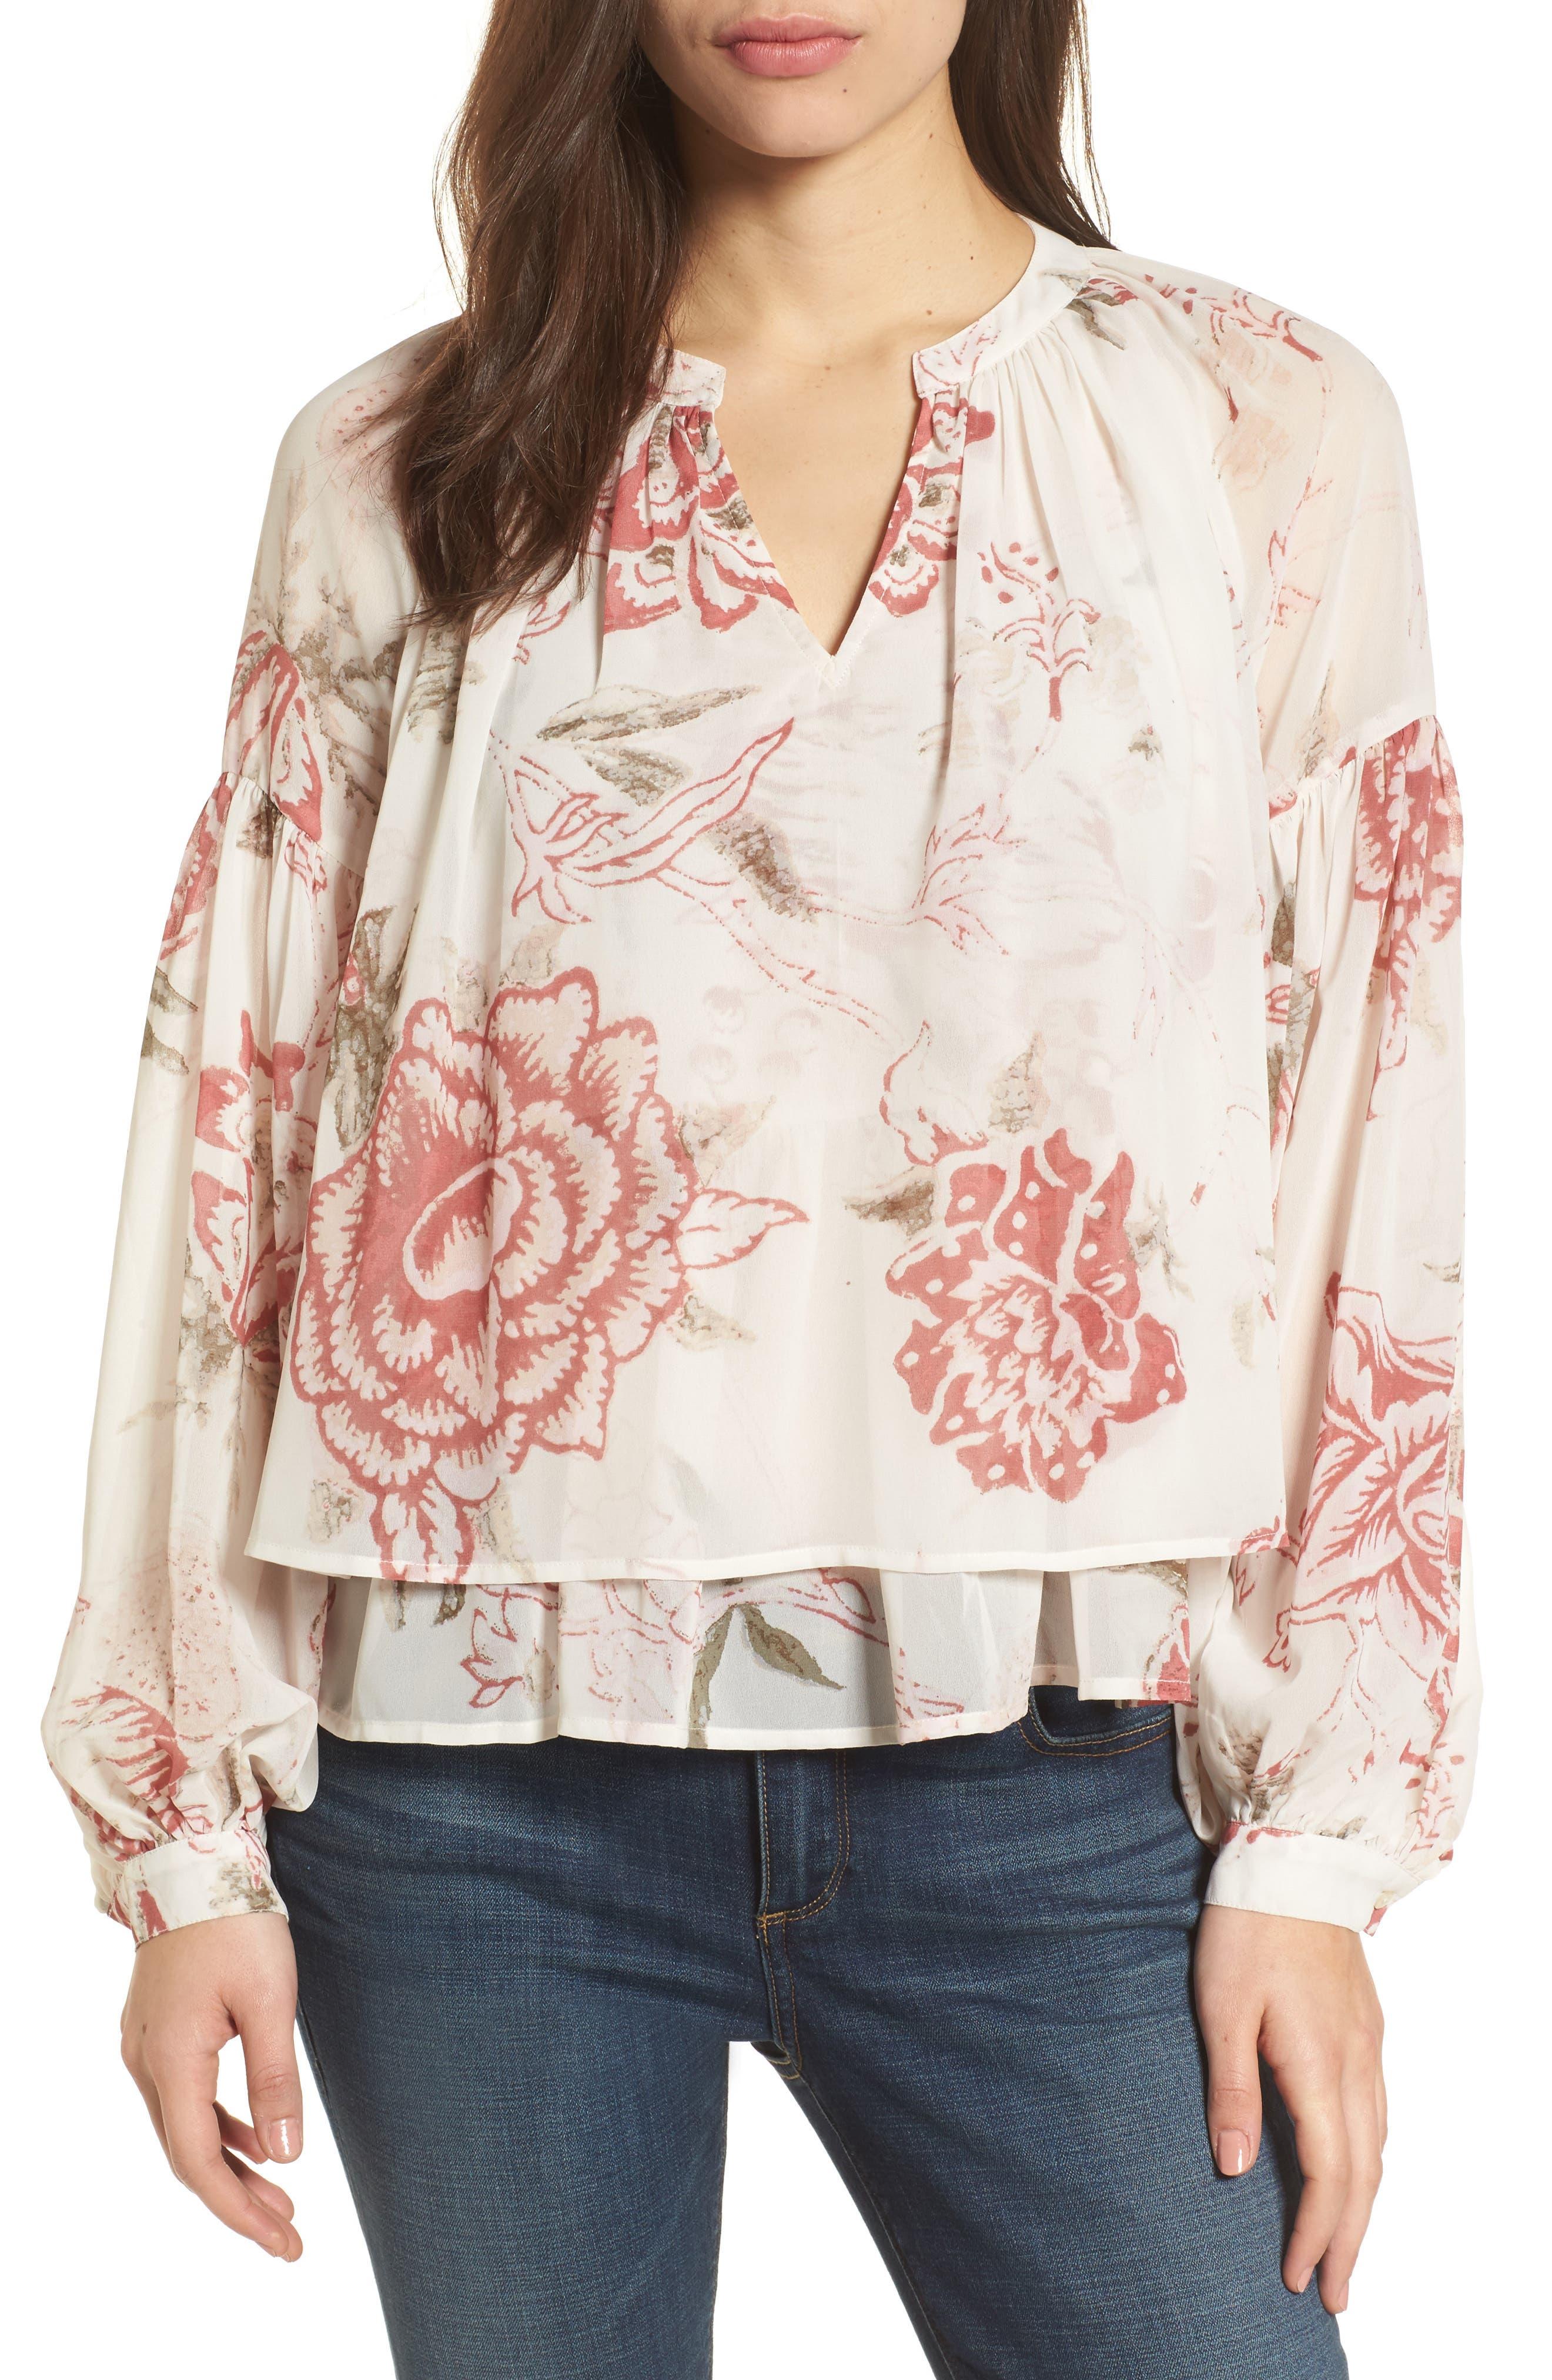 Alternate Image 1 Selected - Lucky Brand Floral Print Ruffle Hem Blouse